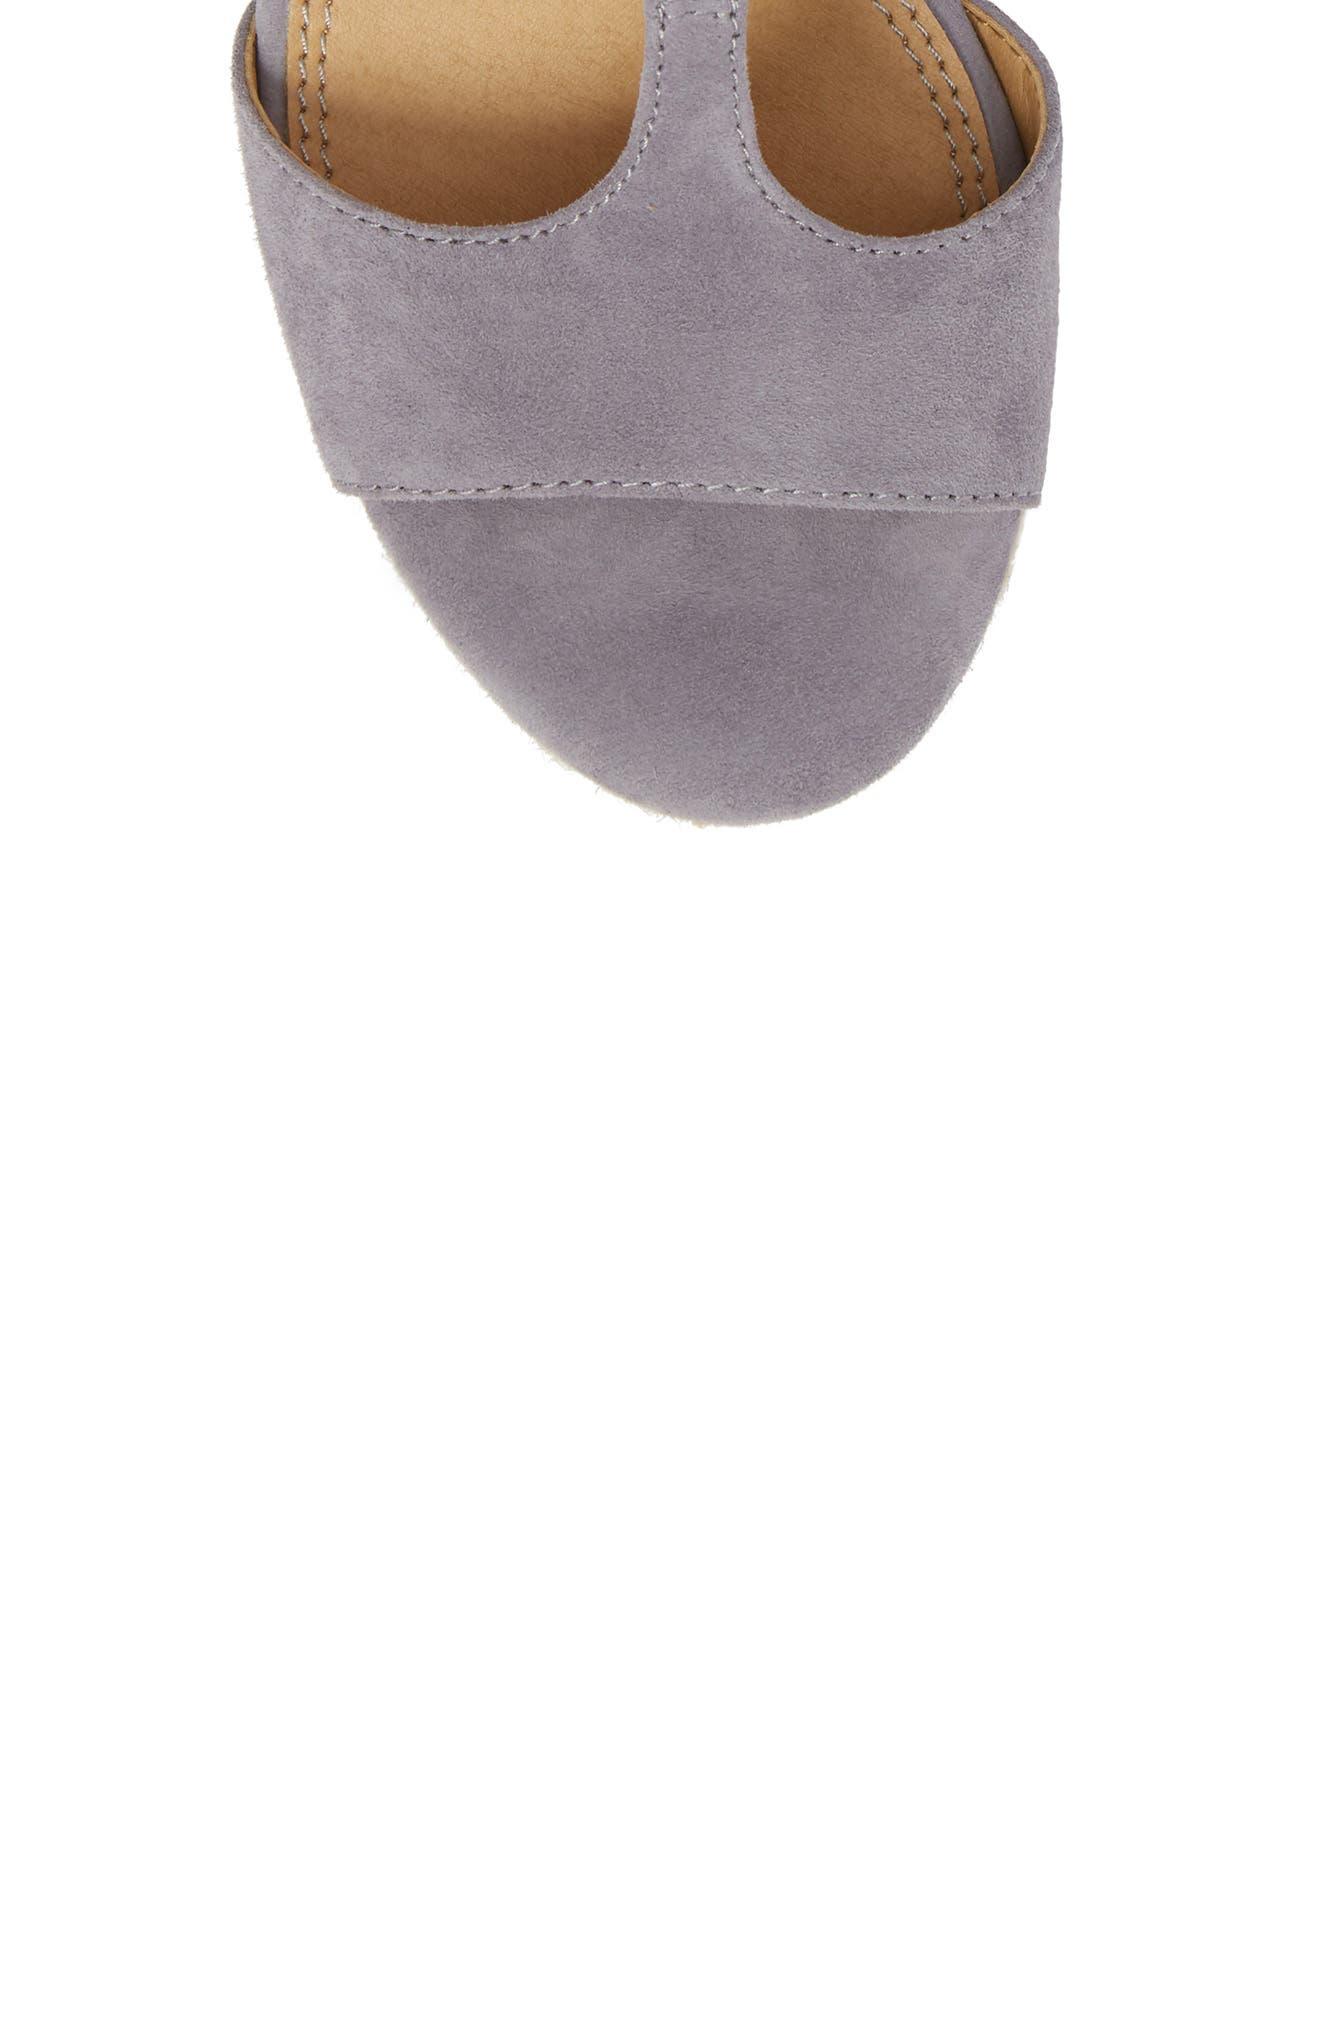 Fianna Espadrille Wedge Sandal,                             Alternate thumbnail 5, color,                             STEEL GREY SUEDE